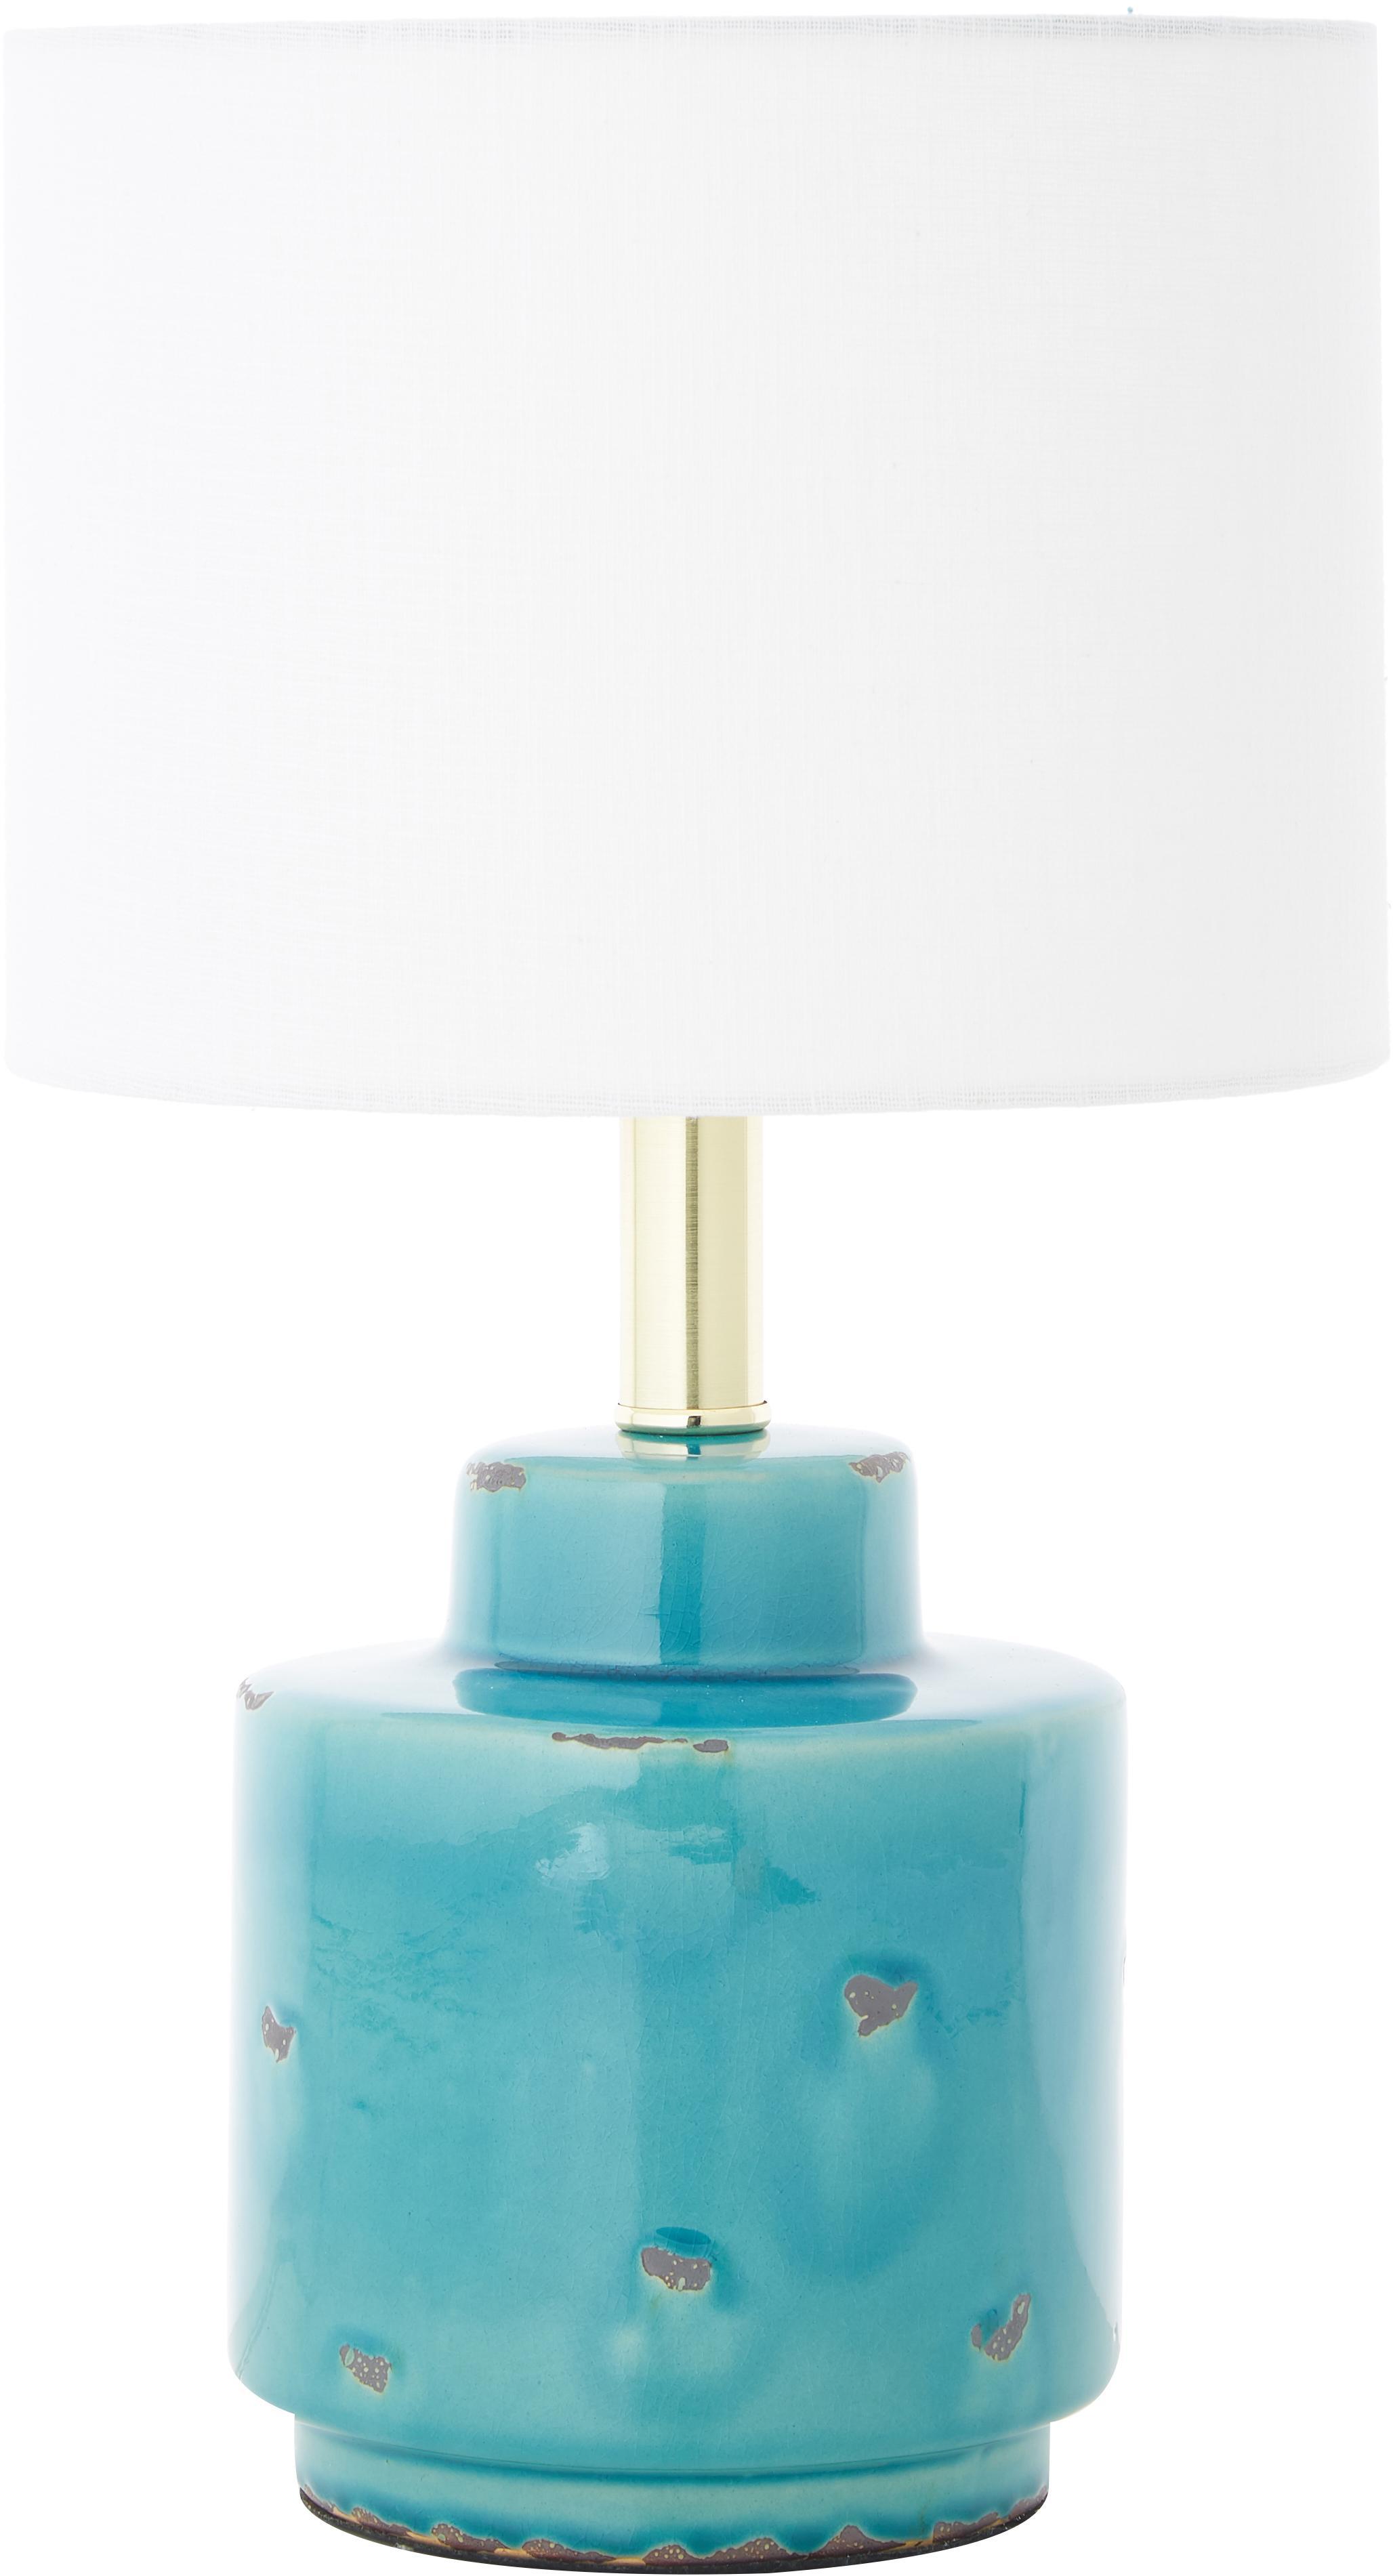 Keramik-Tischlampe Cous mit Antik-Finish, Lampenschirm: Polyester, Lampenschirm: Weiss Lampenfuss: Blau mit Antik-Finish, Ø 24 x H 42 cm